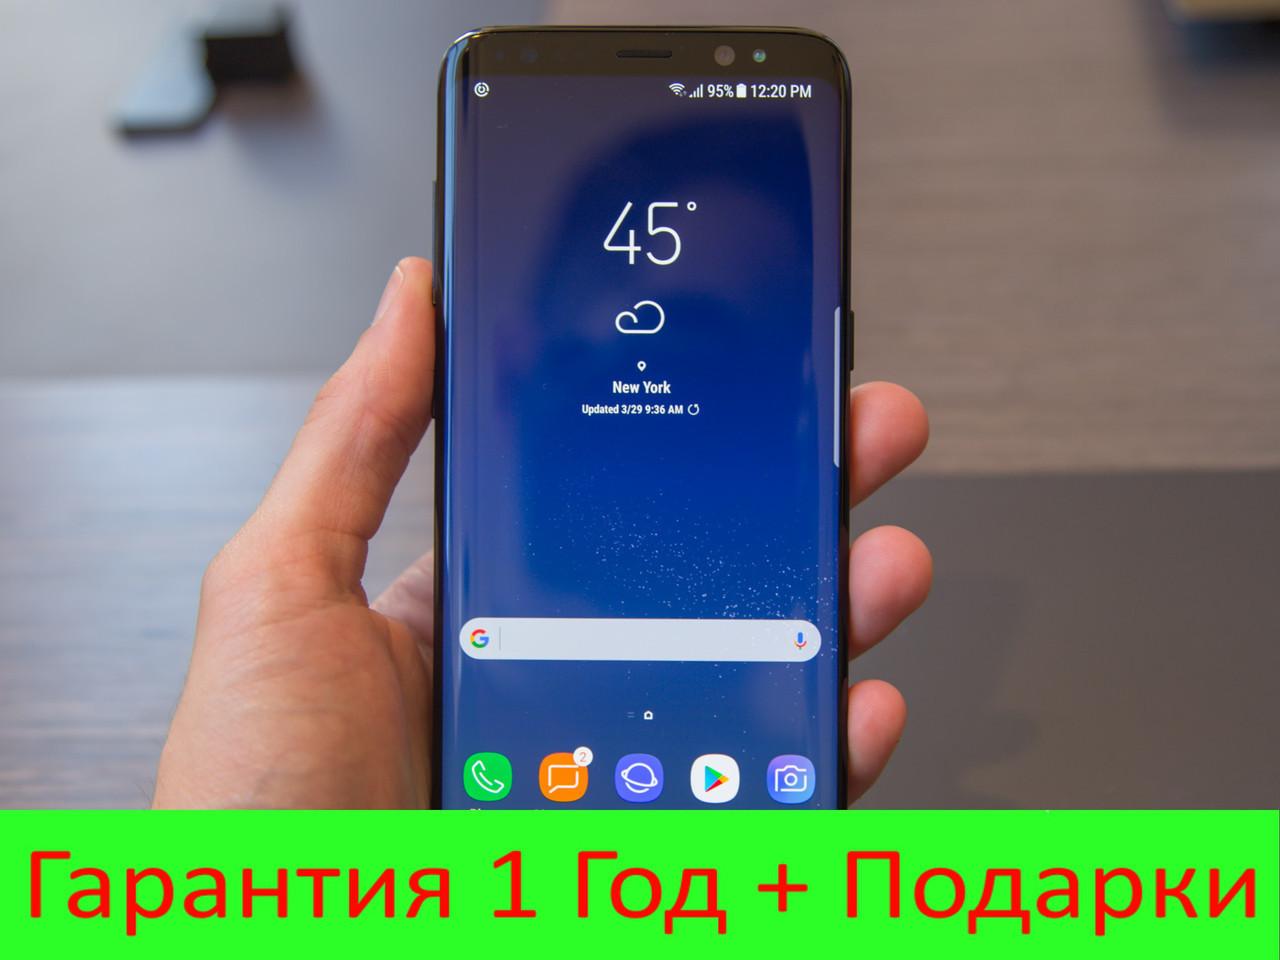 Новый Samsung Galaxy S9 + Чехол Стекло в подарок !  самсунг /s5/s4/s3/s8/s9/S6